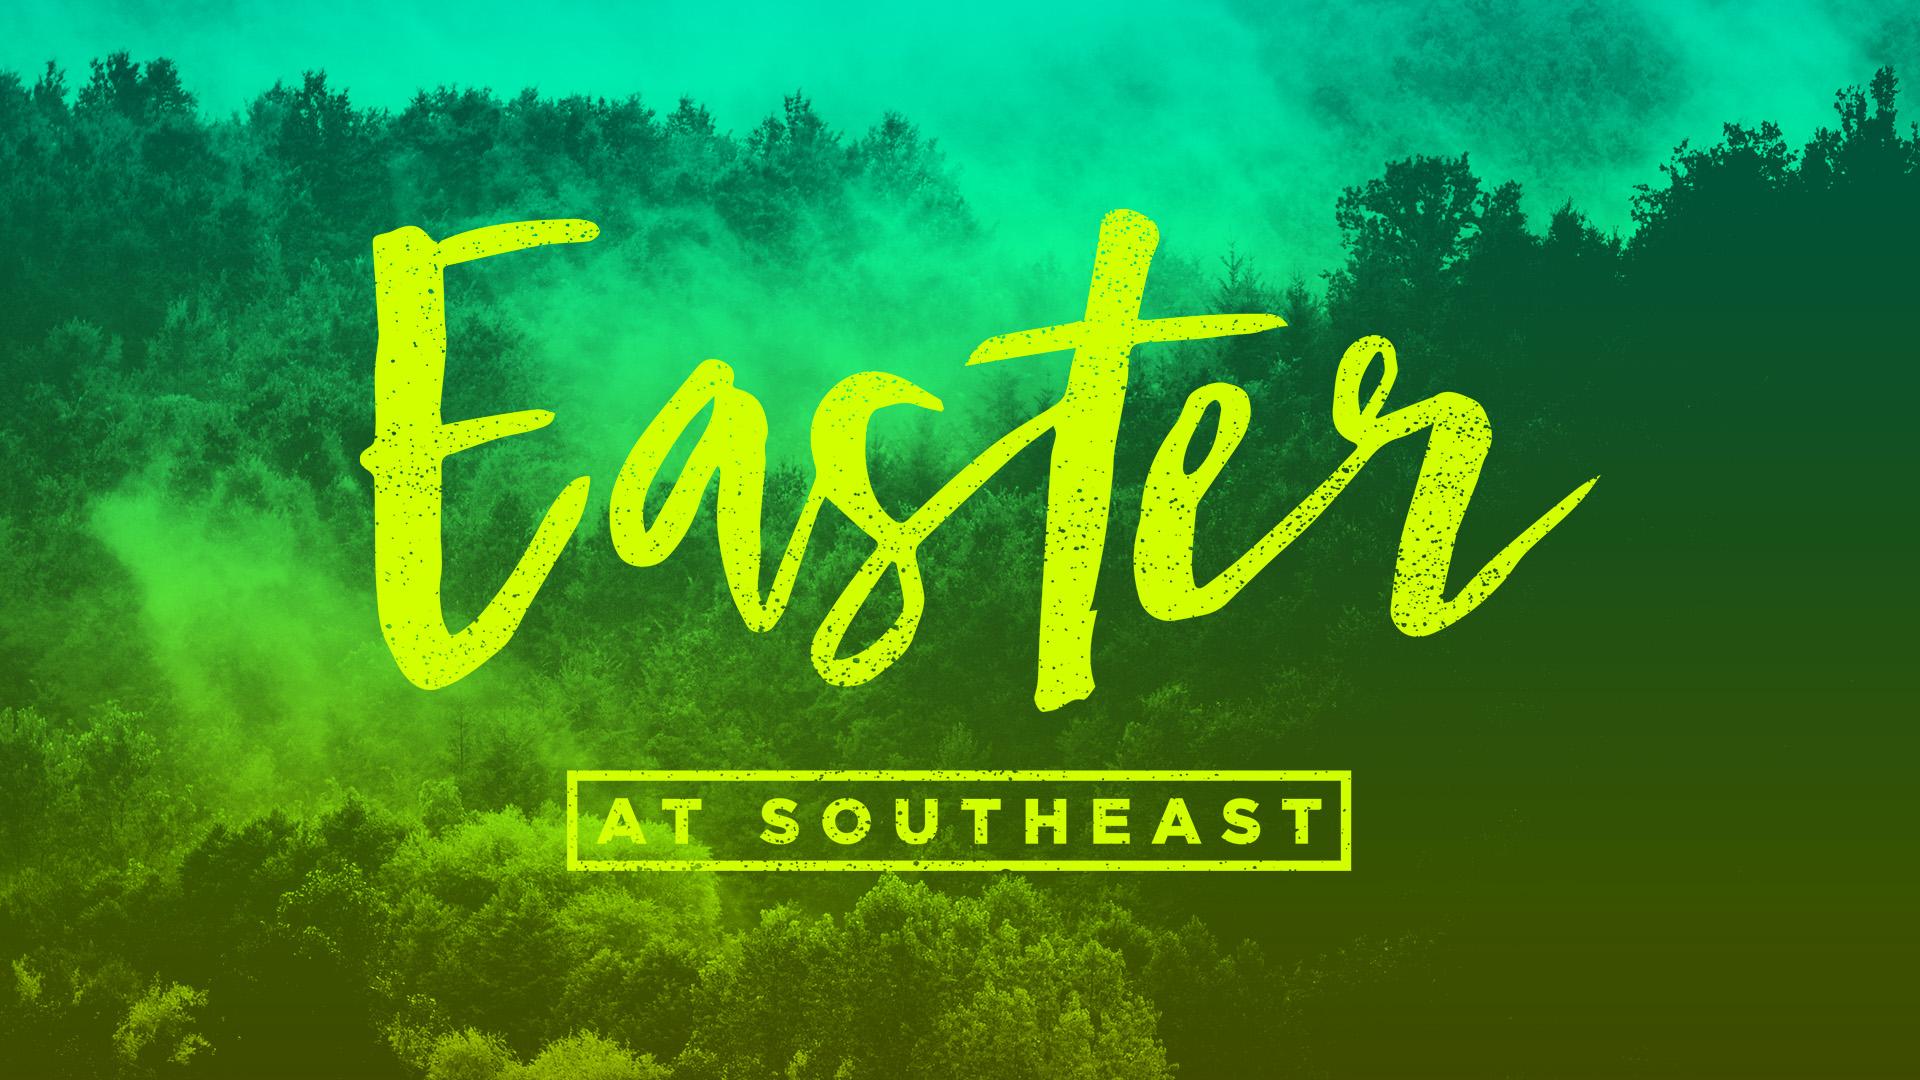 Southeast Christian Church: Easter | Shane Harris - Melbourne Florida Graphic Design